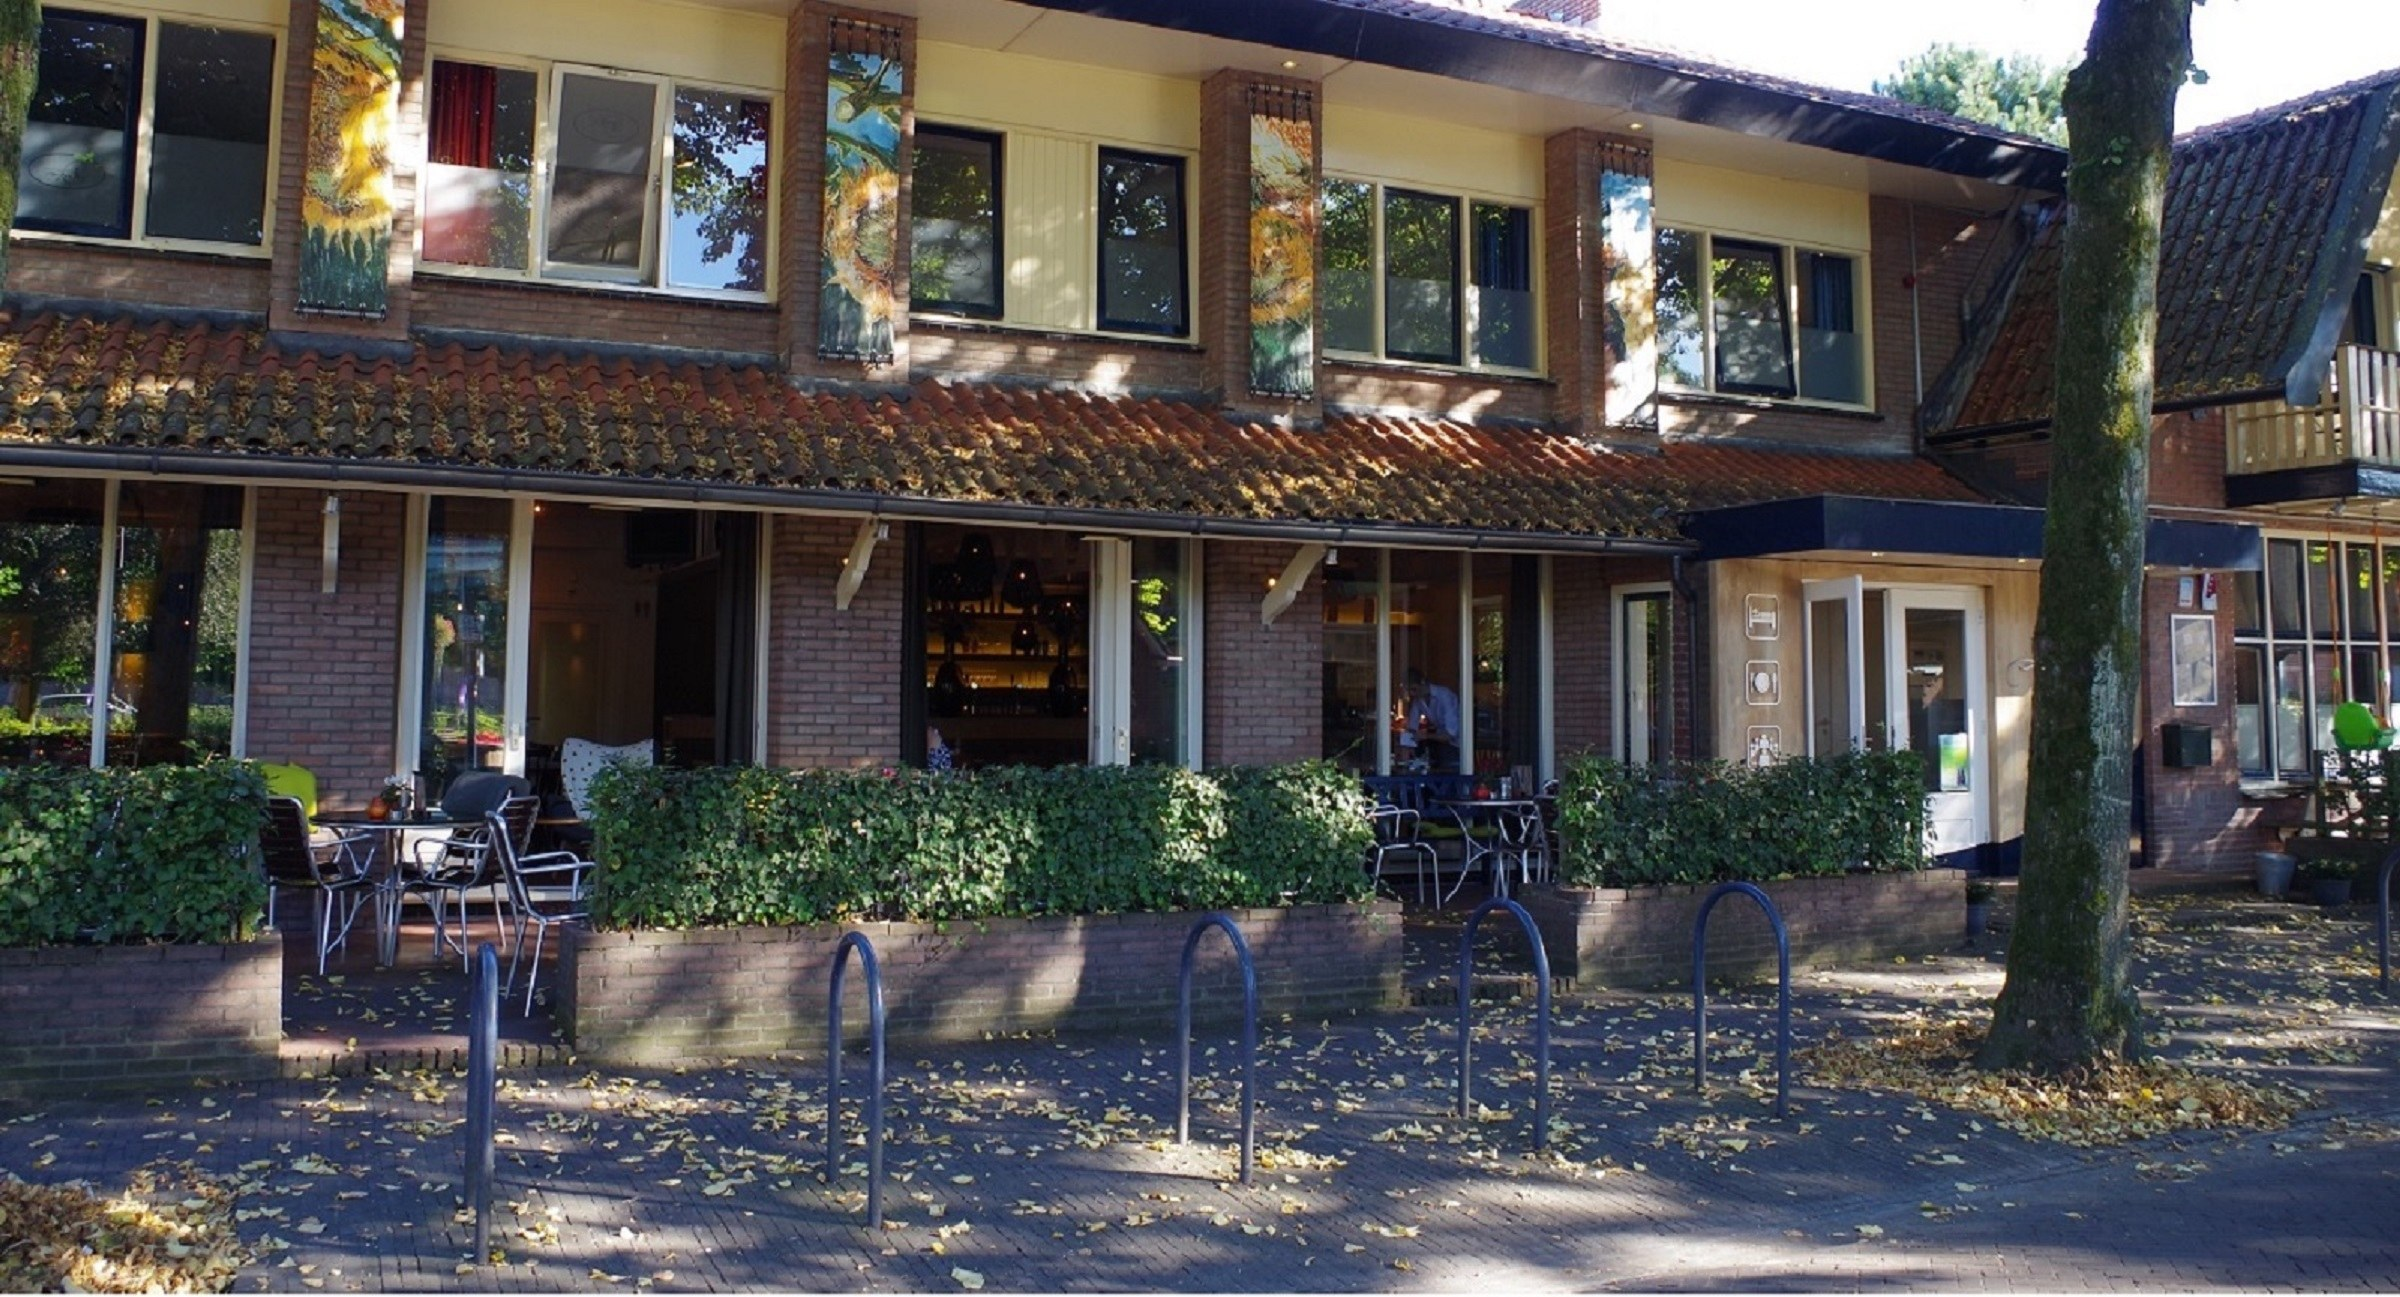 Grand Café Hotel Kruller